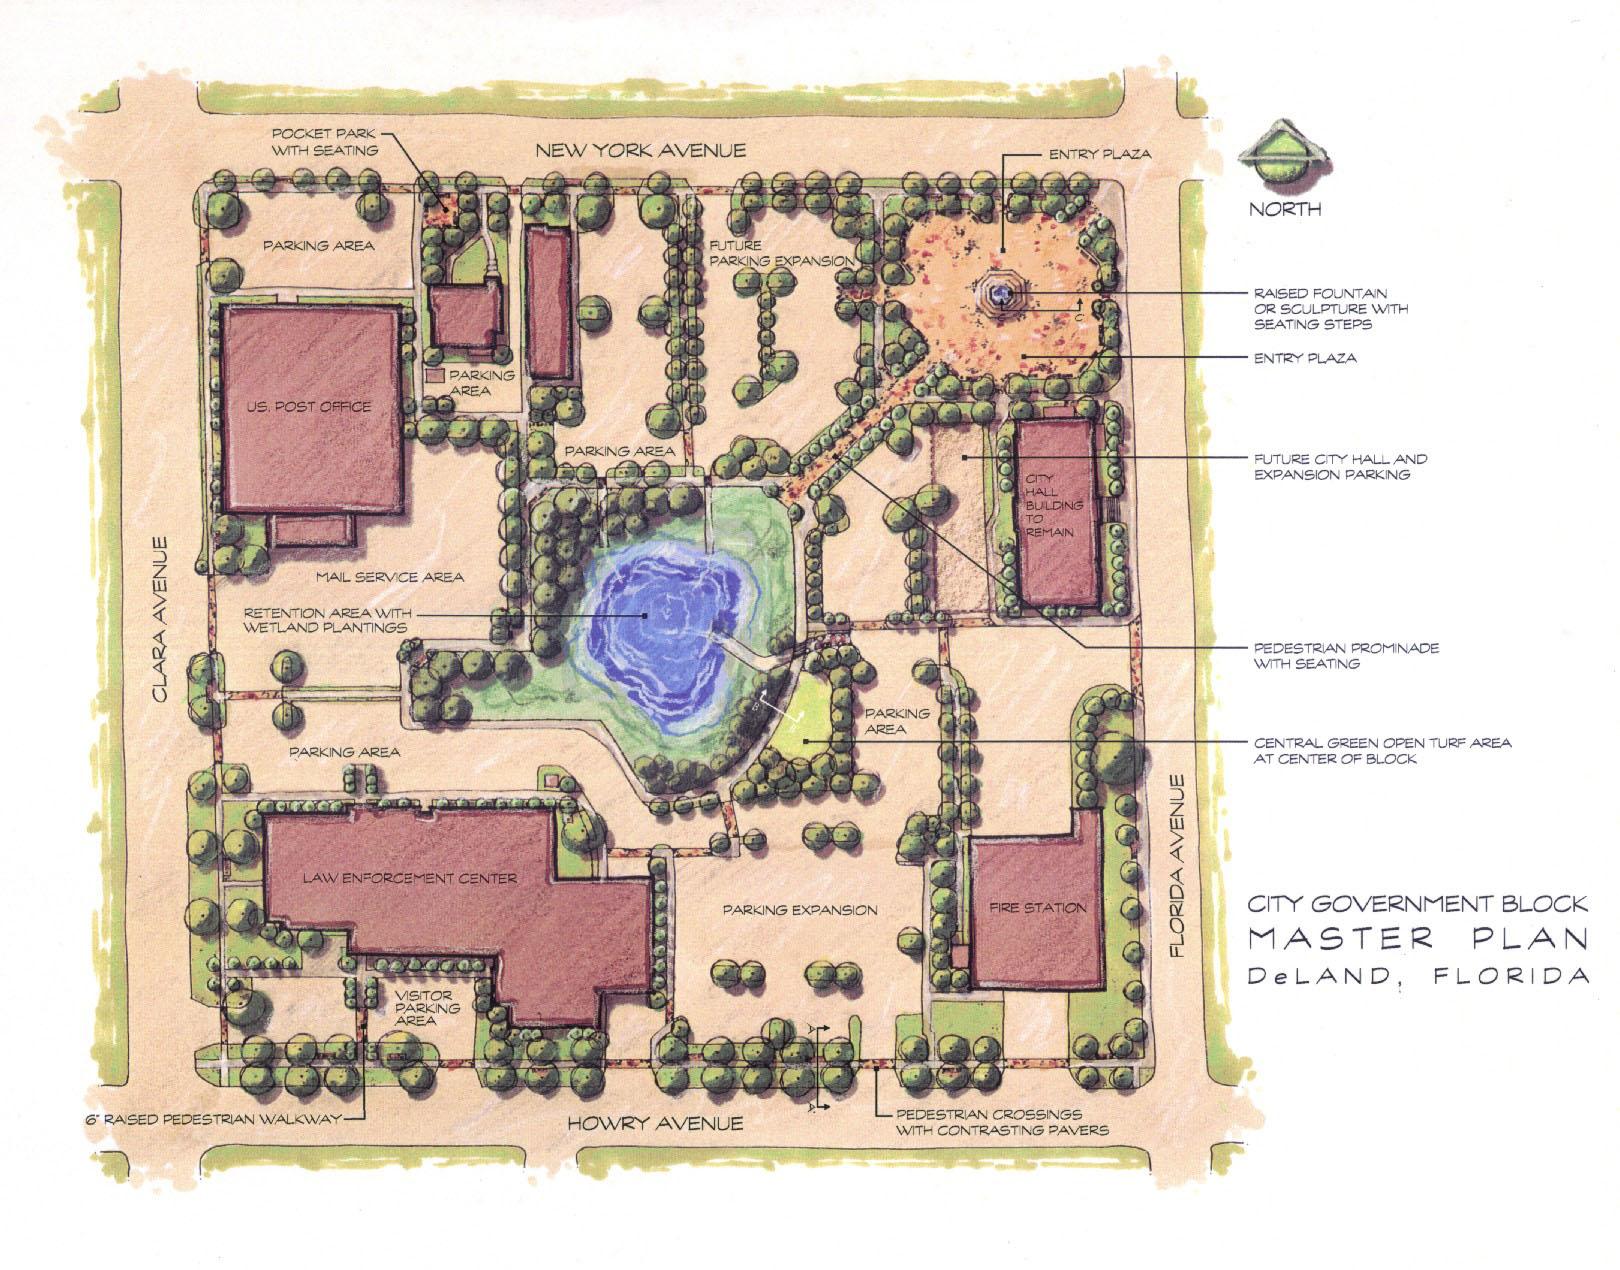 DeLand Downtown Master Plan